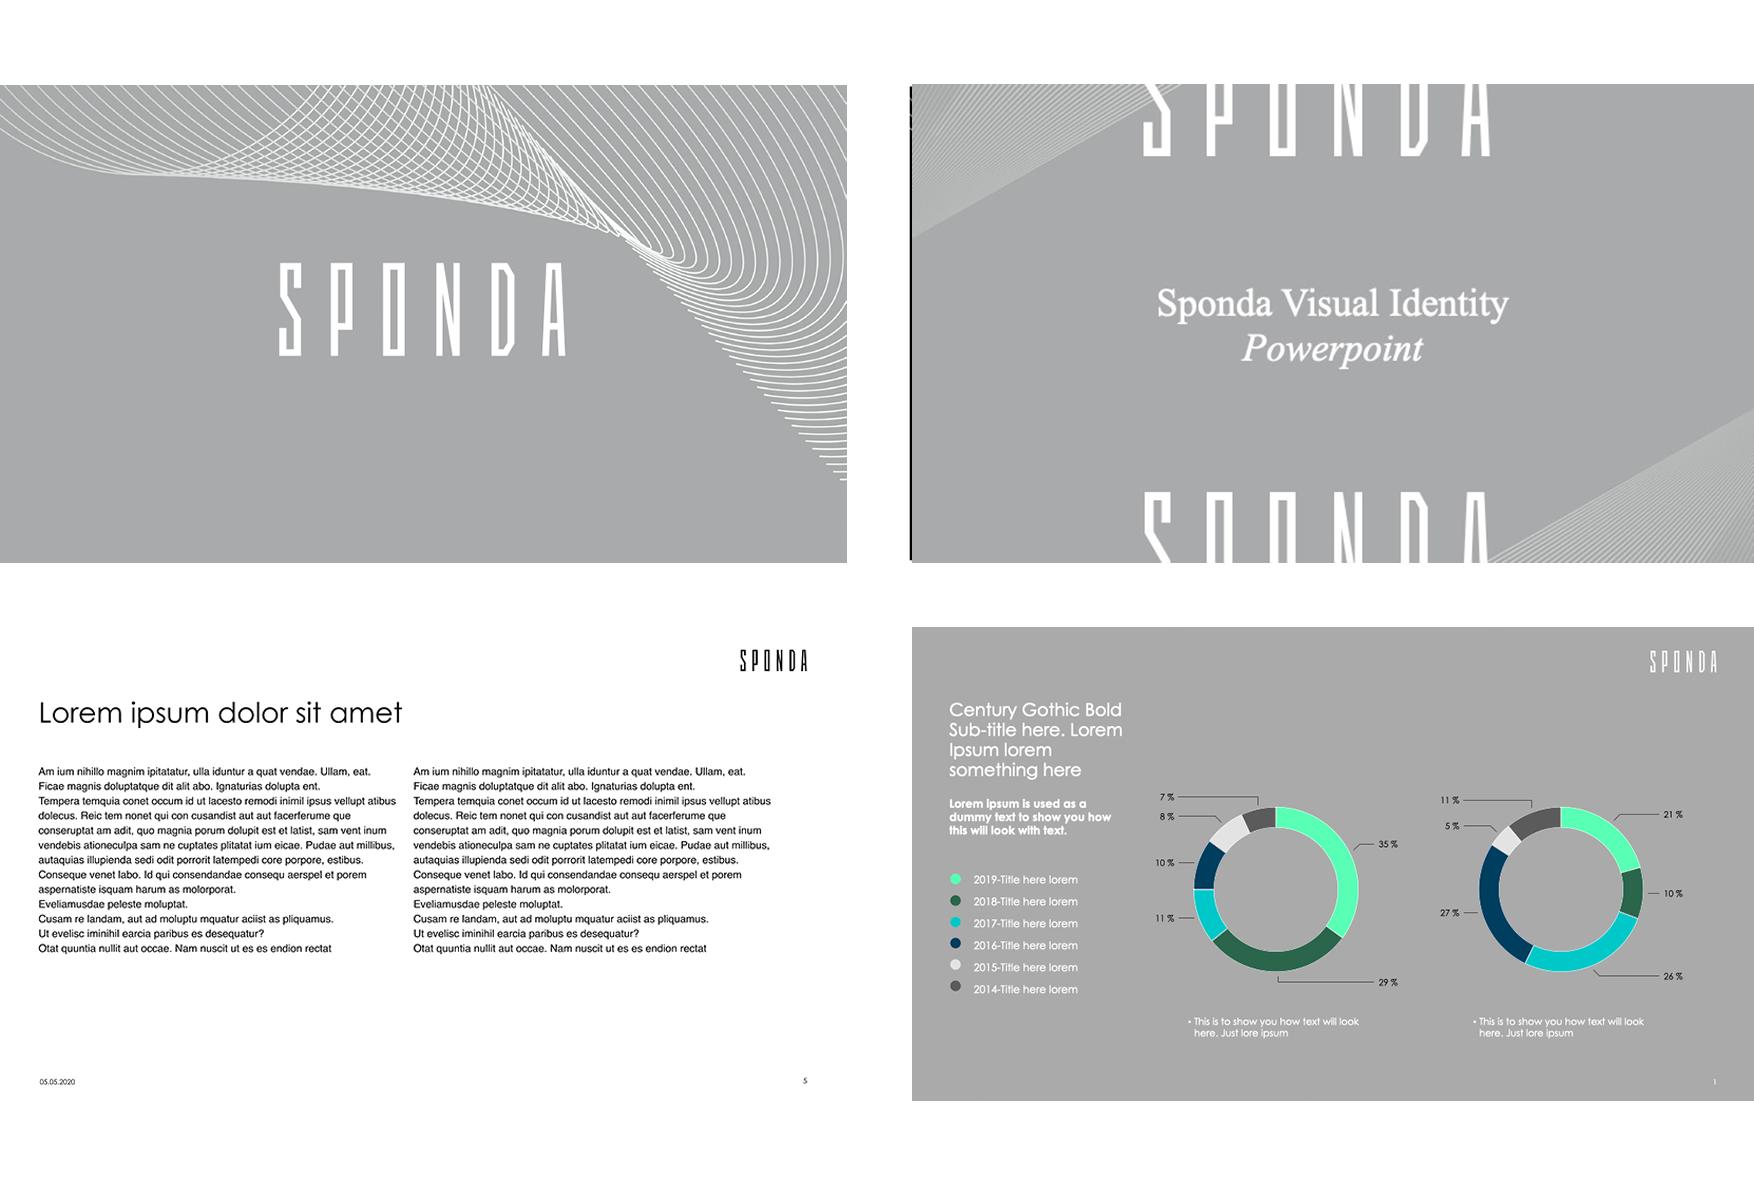 sponda_ppt_layout